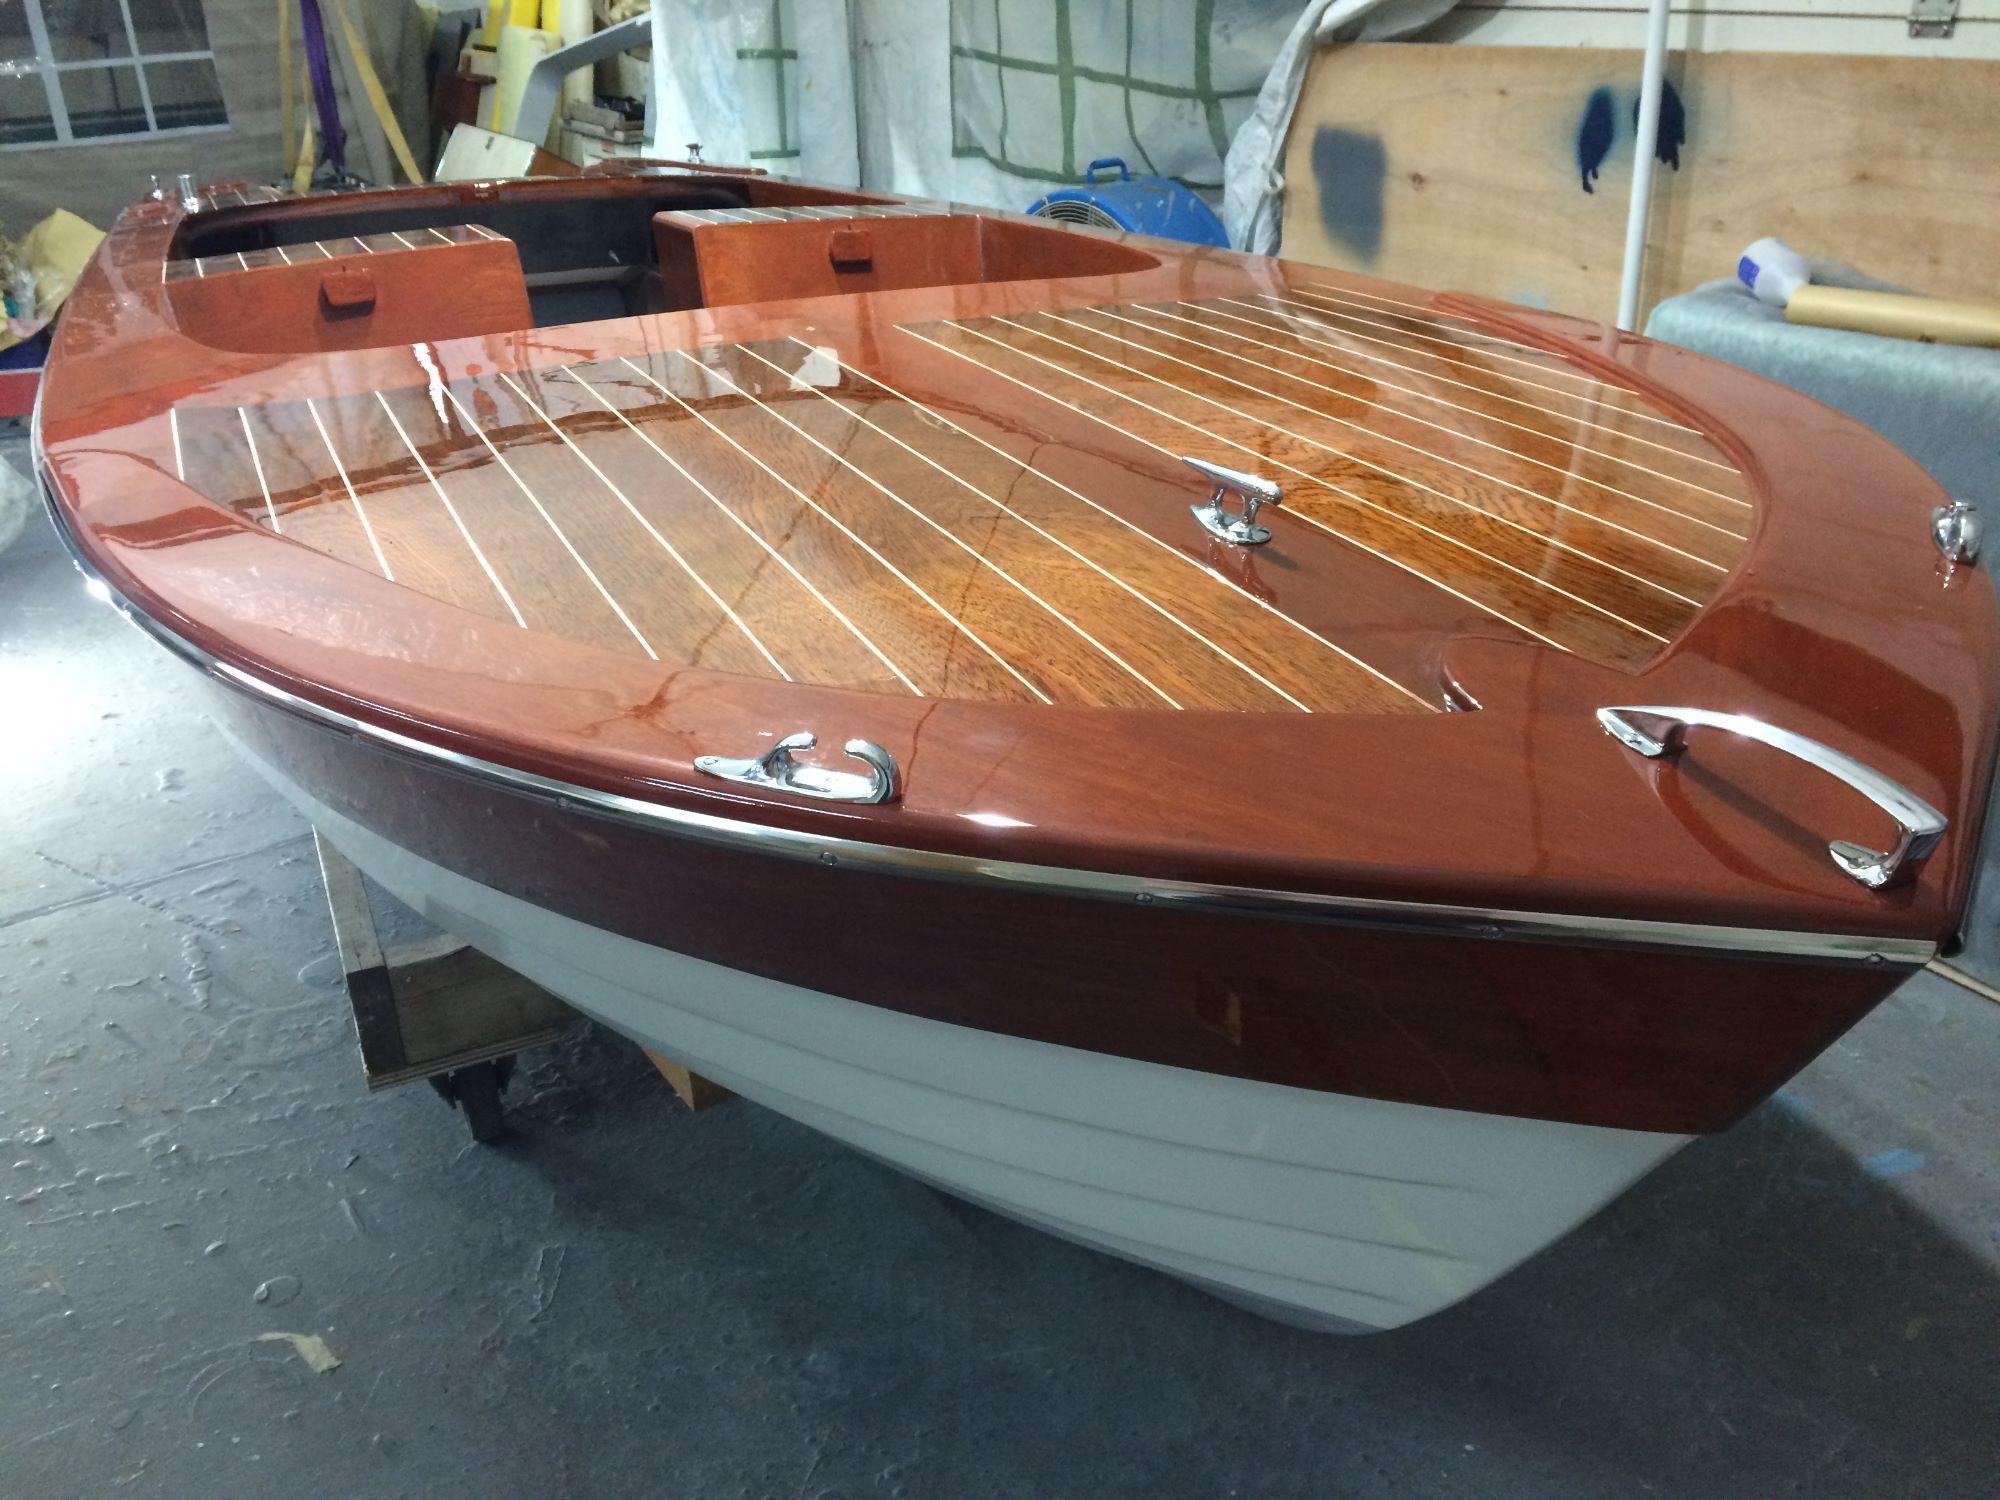 marine gloss varnish on a broom viking at fine wooden boats workshop